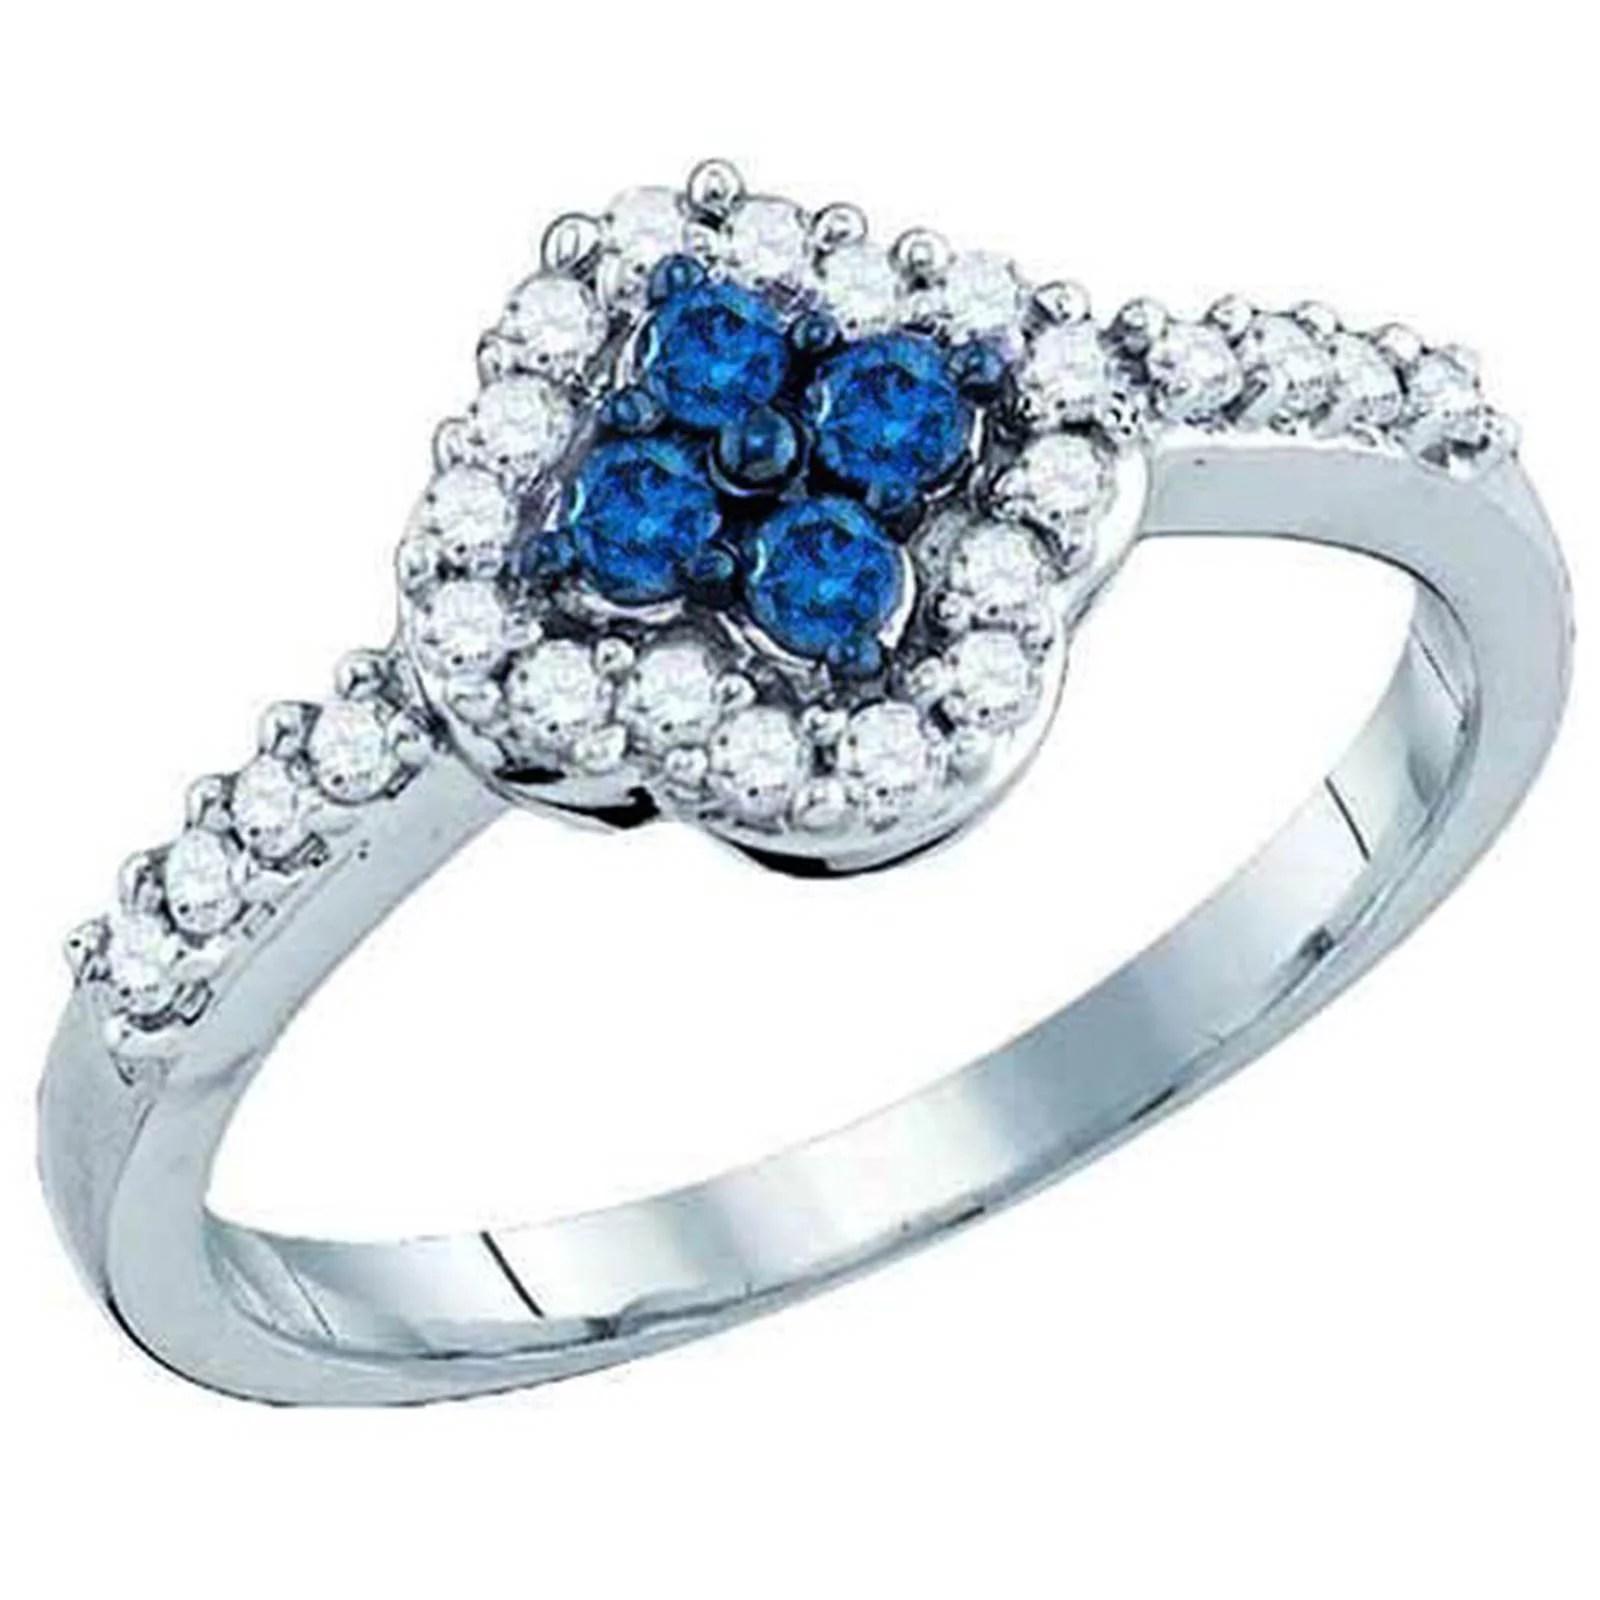 Ladies White Gold Round Cut Blue Diamond Anniversary